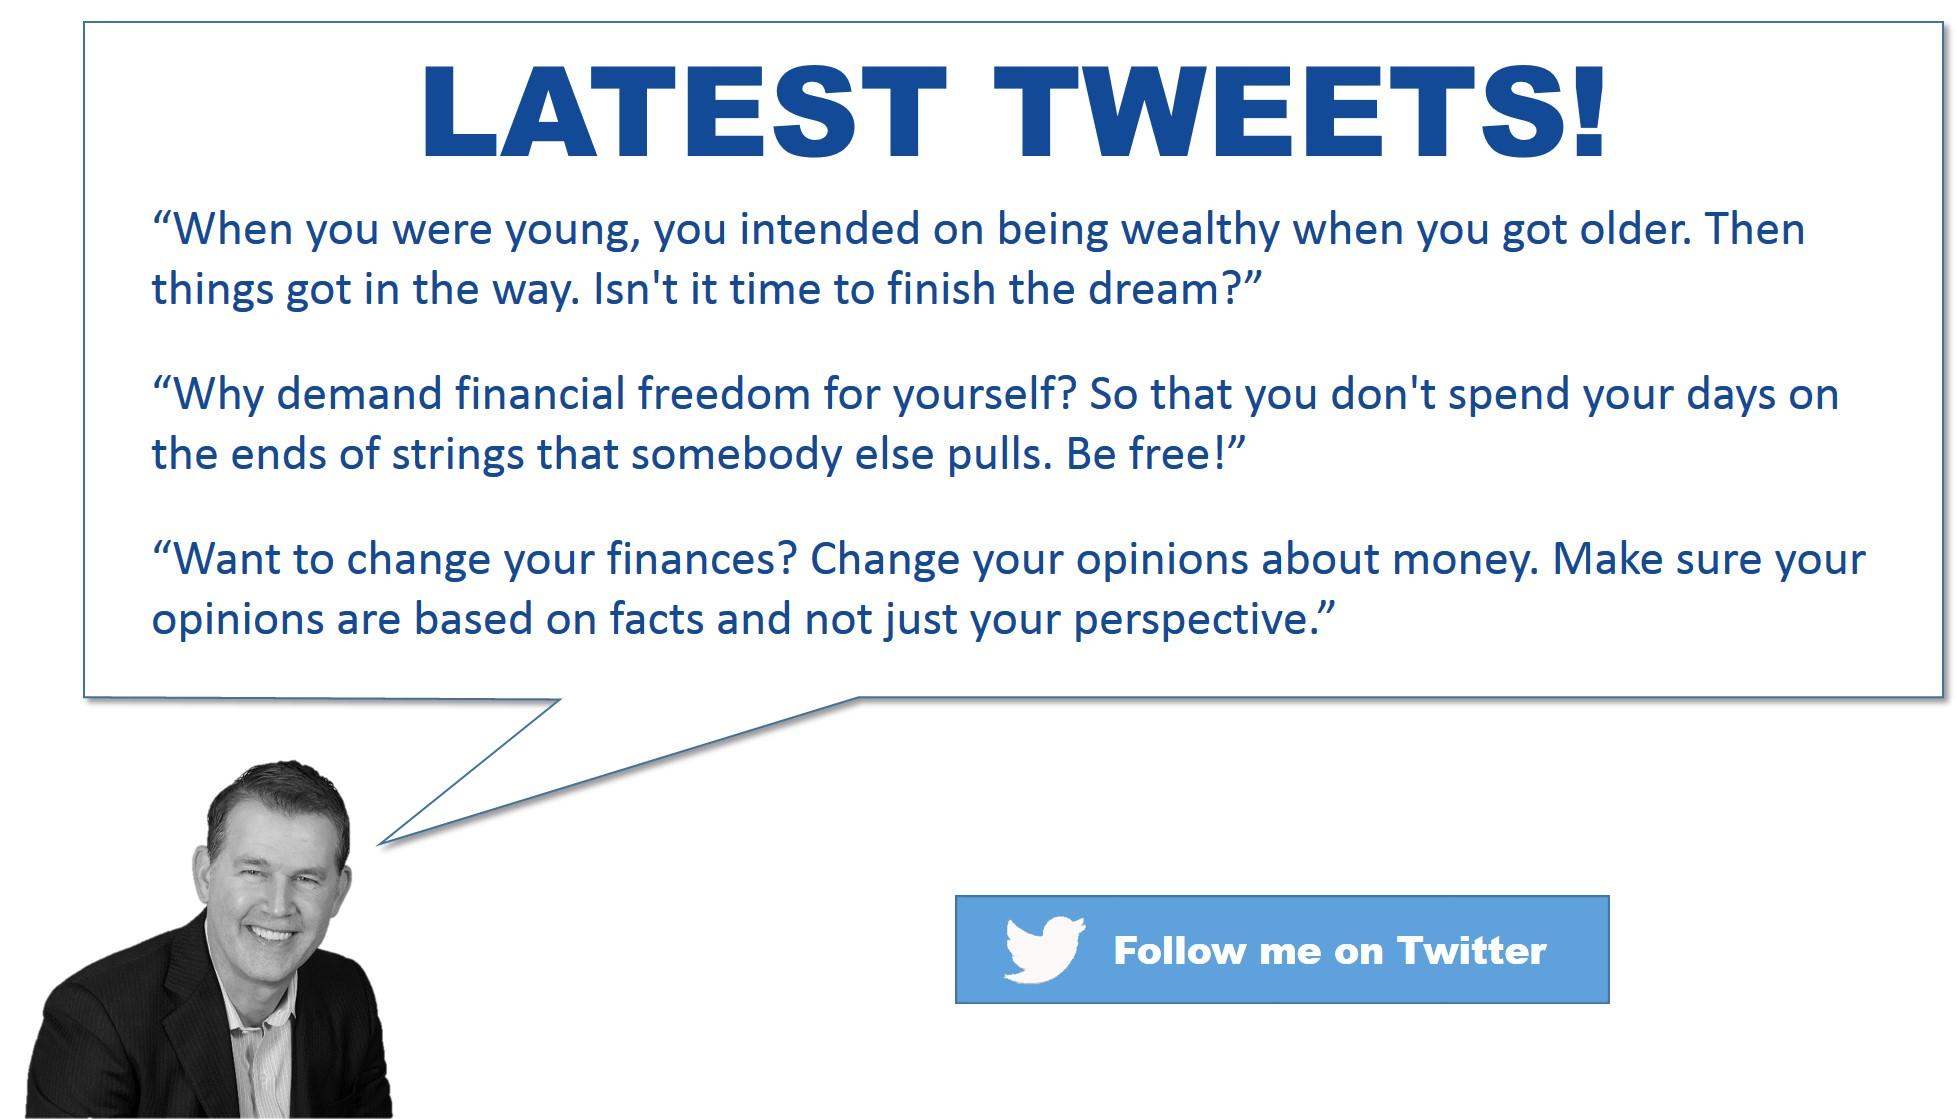 MontyCampbell-Tweets-7-30-16